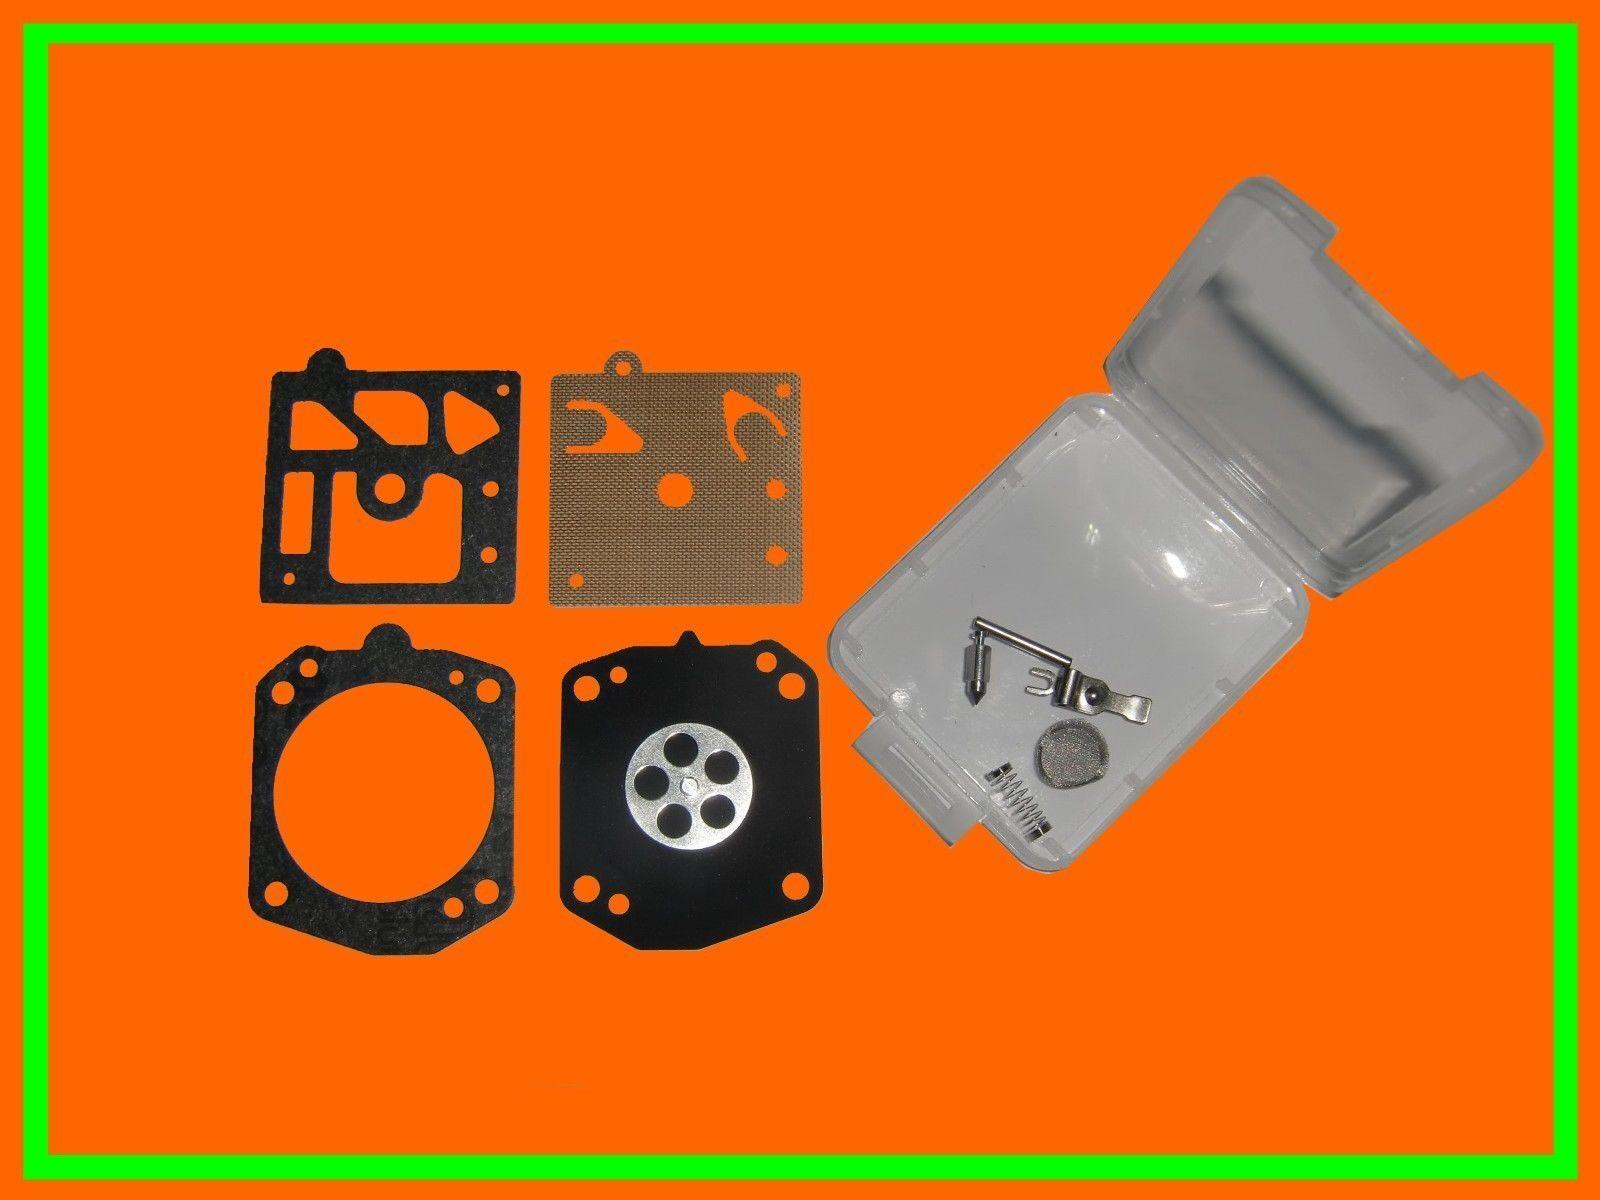 Membransatz Walbro für Stihl 046 MS460 MS 460 carburator diaphragm kit